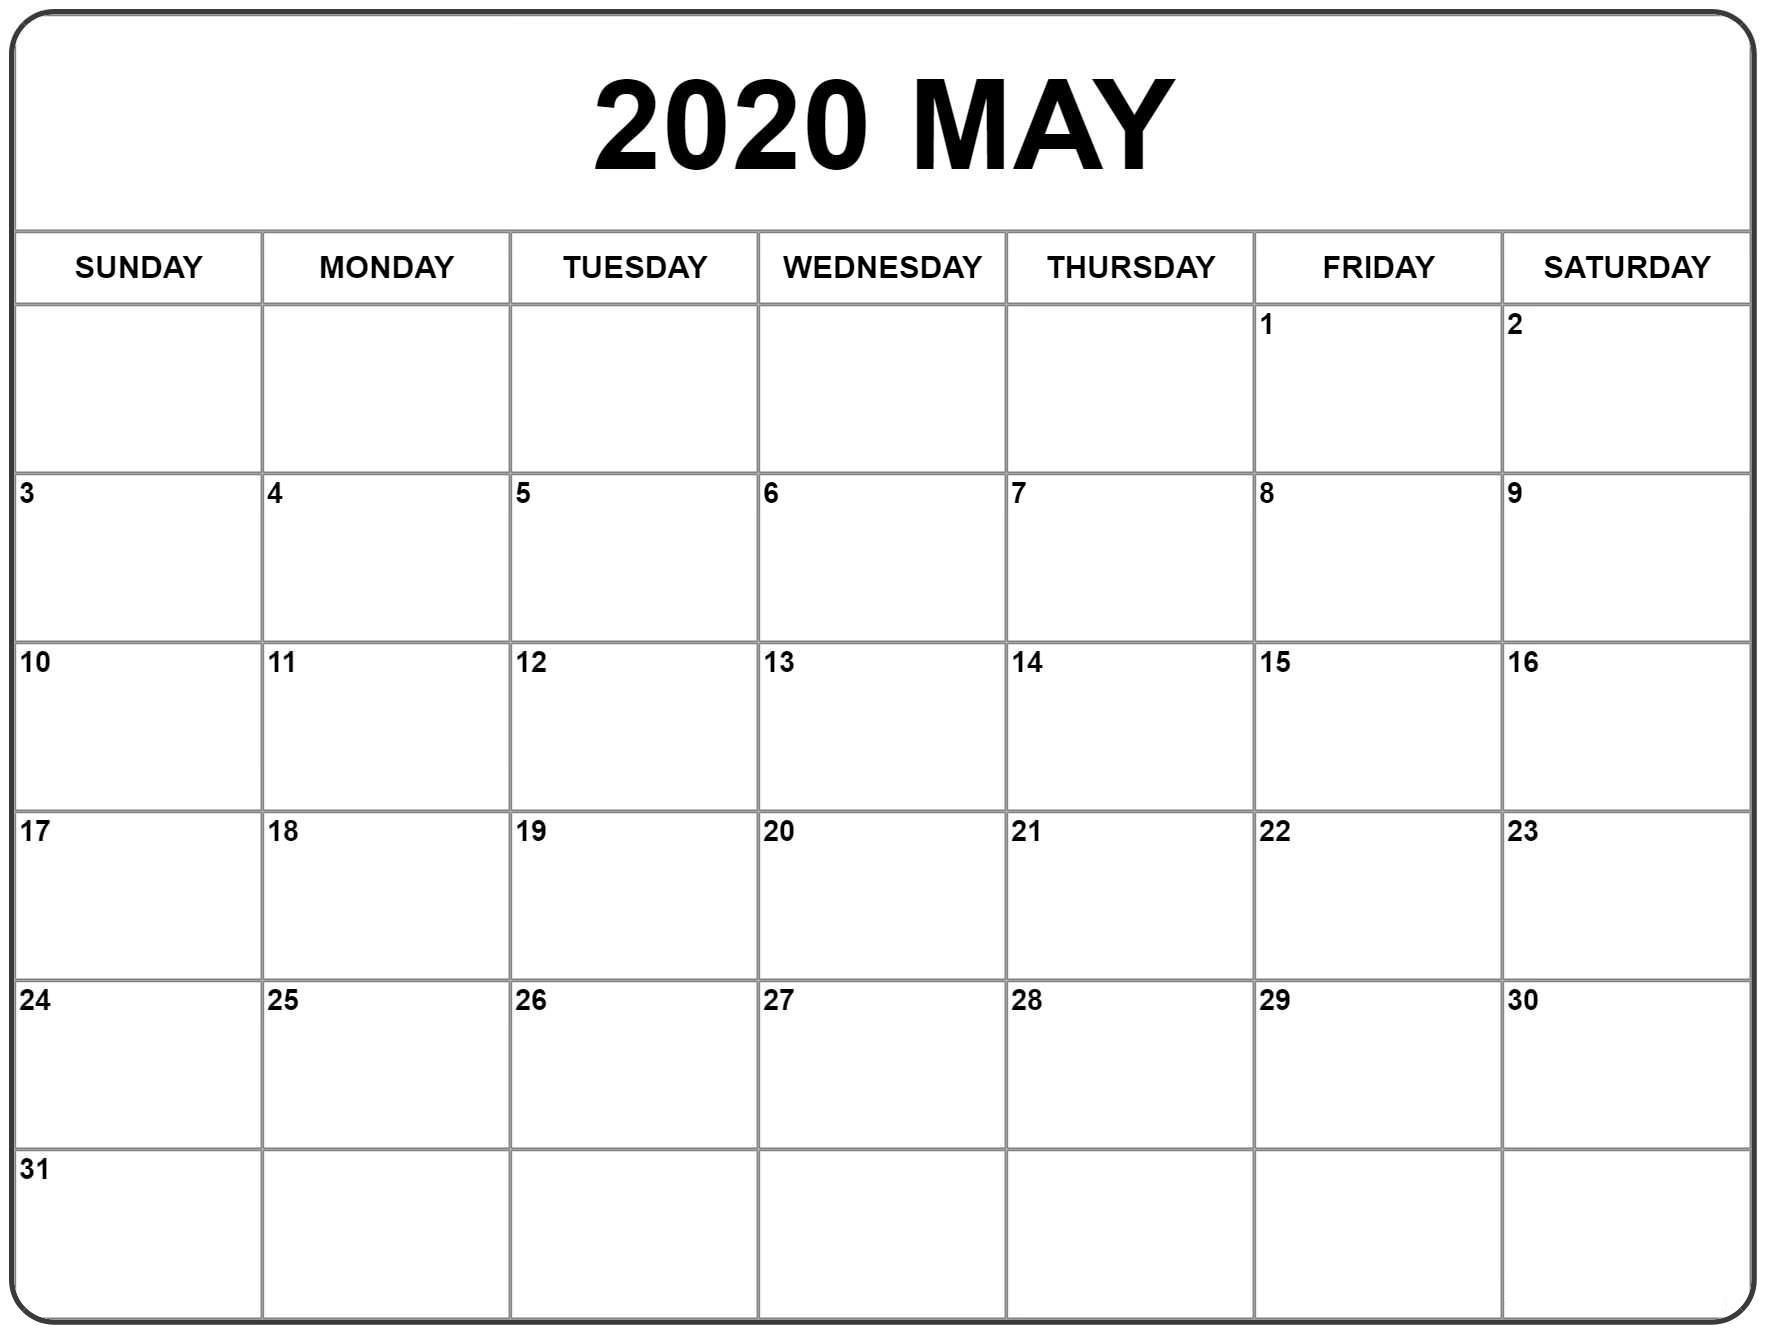 May Calendar 2020 Wallpaper